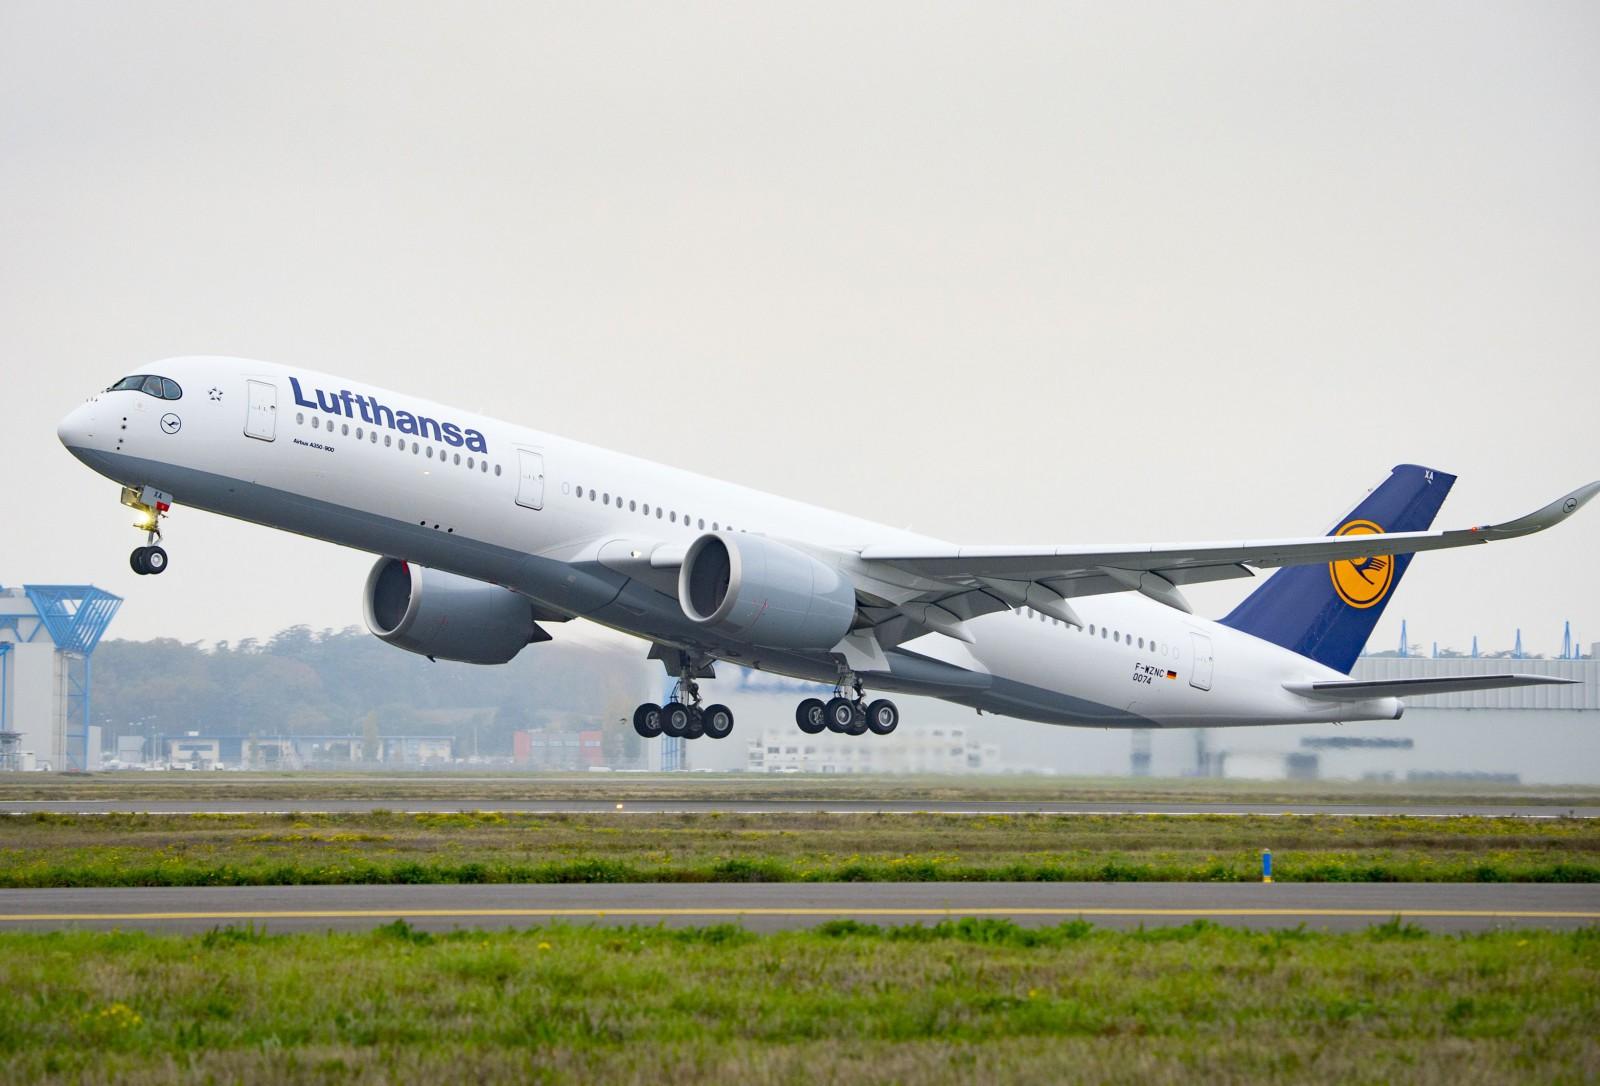 Lufthansa hiring spree